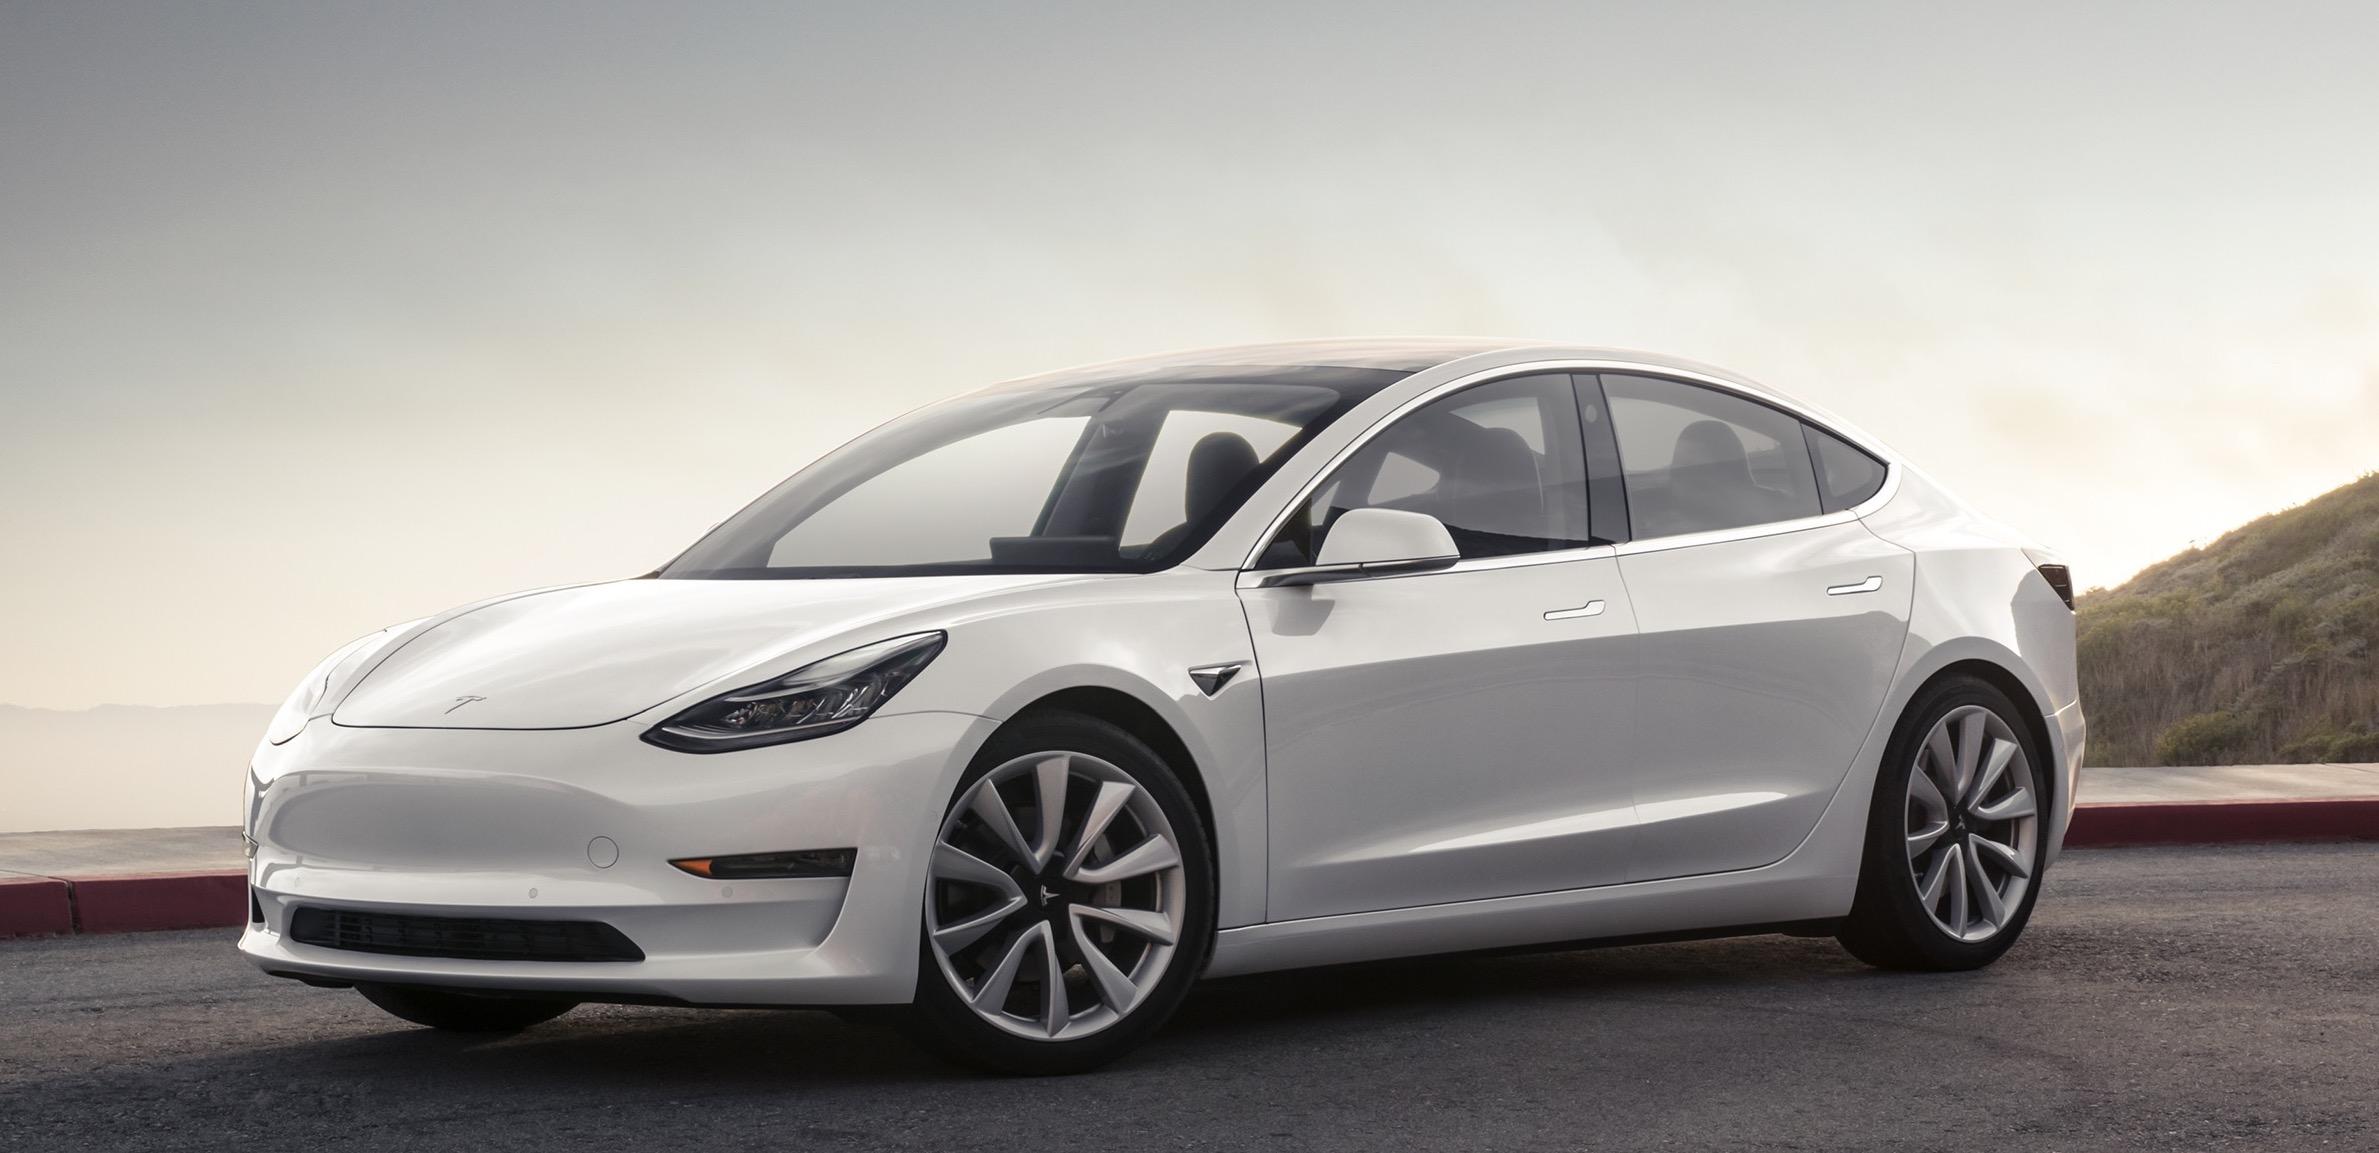 A white Tesla Model 3, a sleek compact luxury sedan